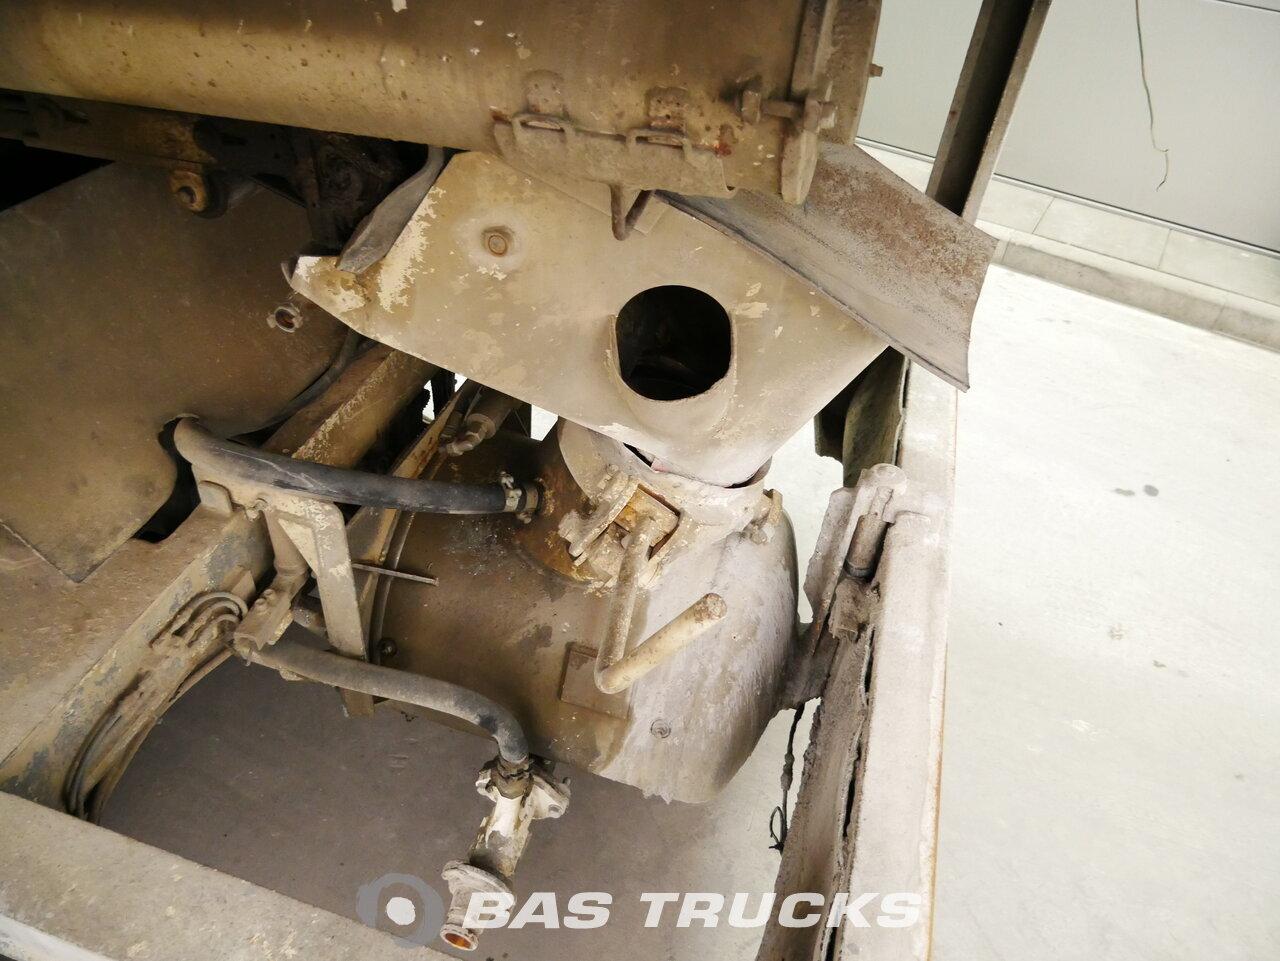 foto de Usado Semirremolque M.C. Machines VLTR Screedpump / Mortar / Estrich / Concrete / Beton / MC Machines Ejes 2006